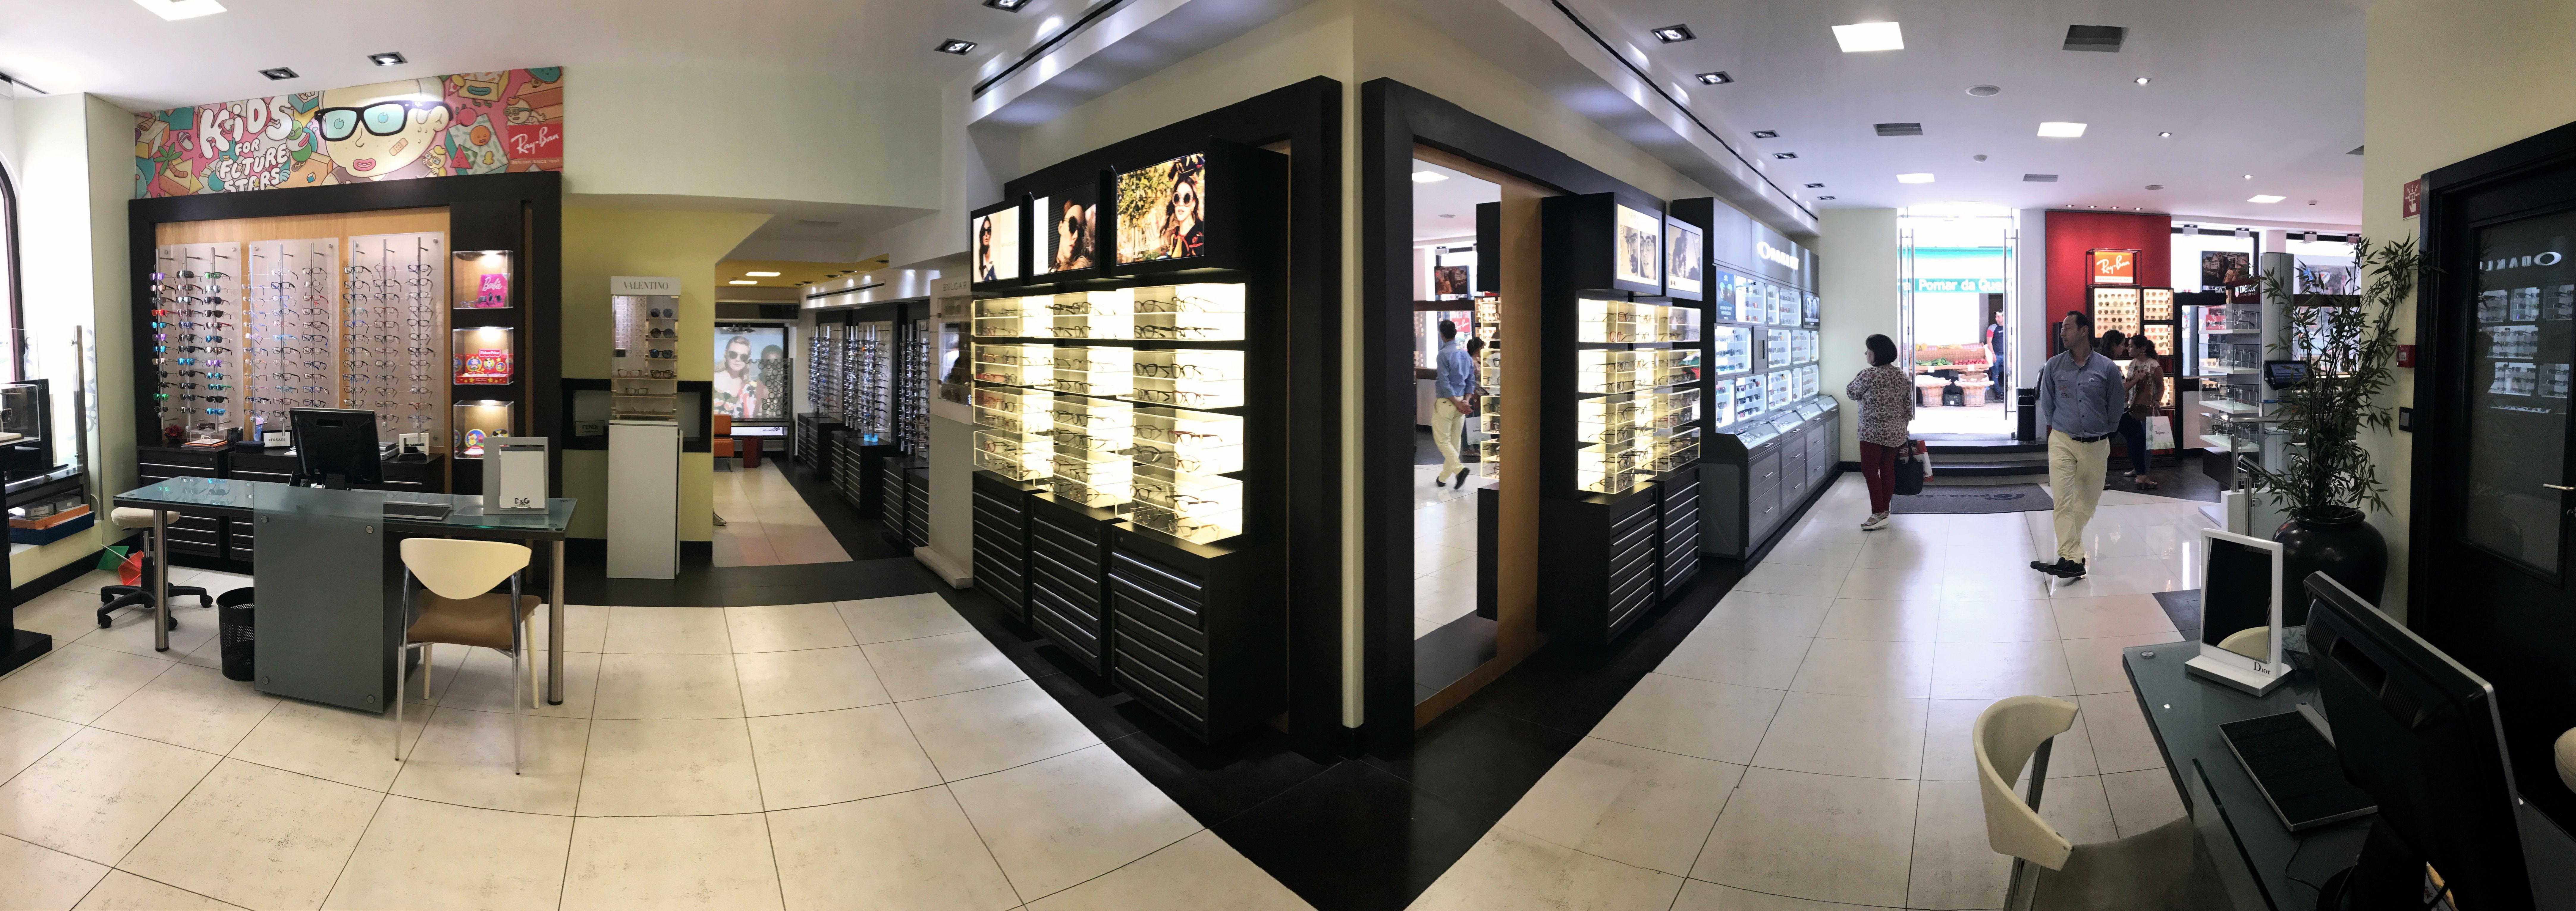 JC Melim_ Expo marcas de luxo4